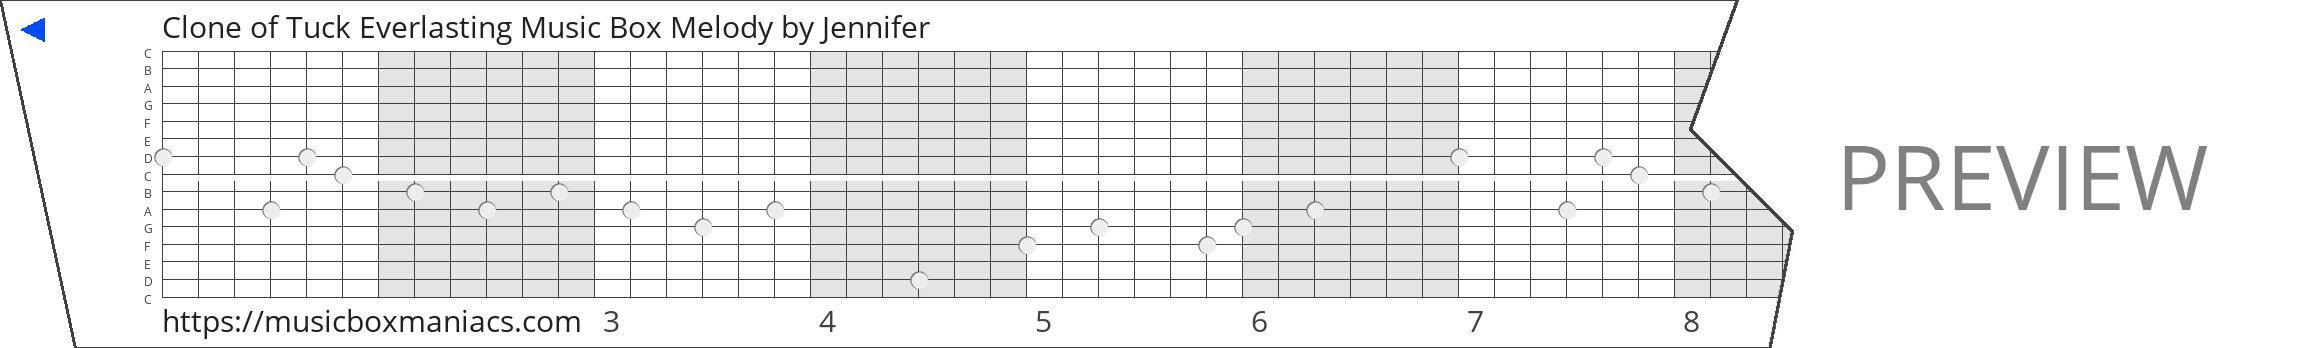 Clone of Tuck Everlasting Music Box Melody 15 note music box paper strip